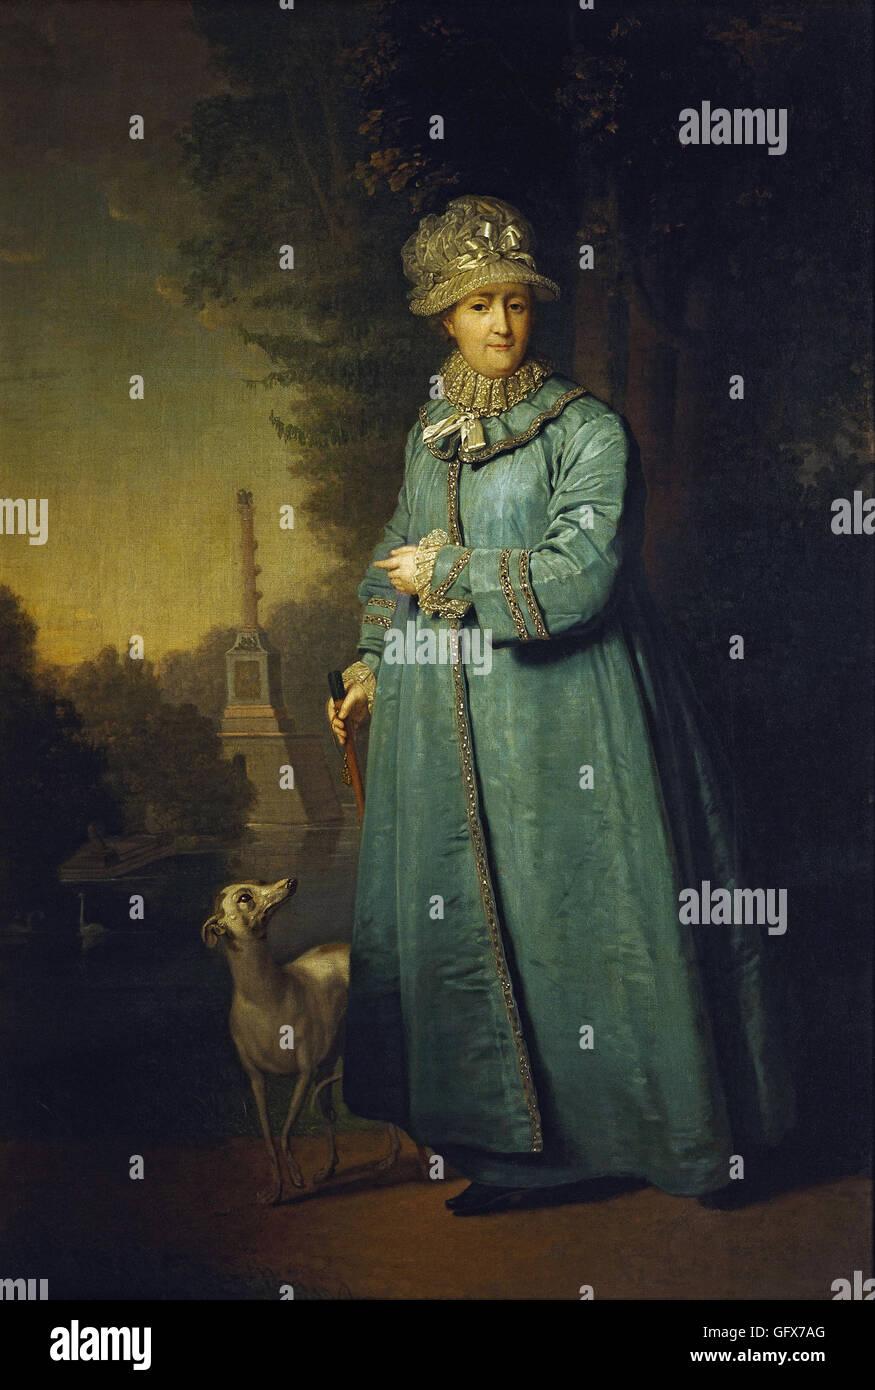 Vladimir Borovikovsky - Catherine II  of Russia - Stock Image